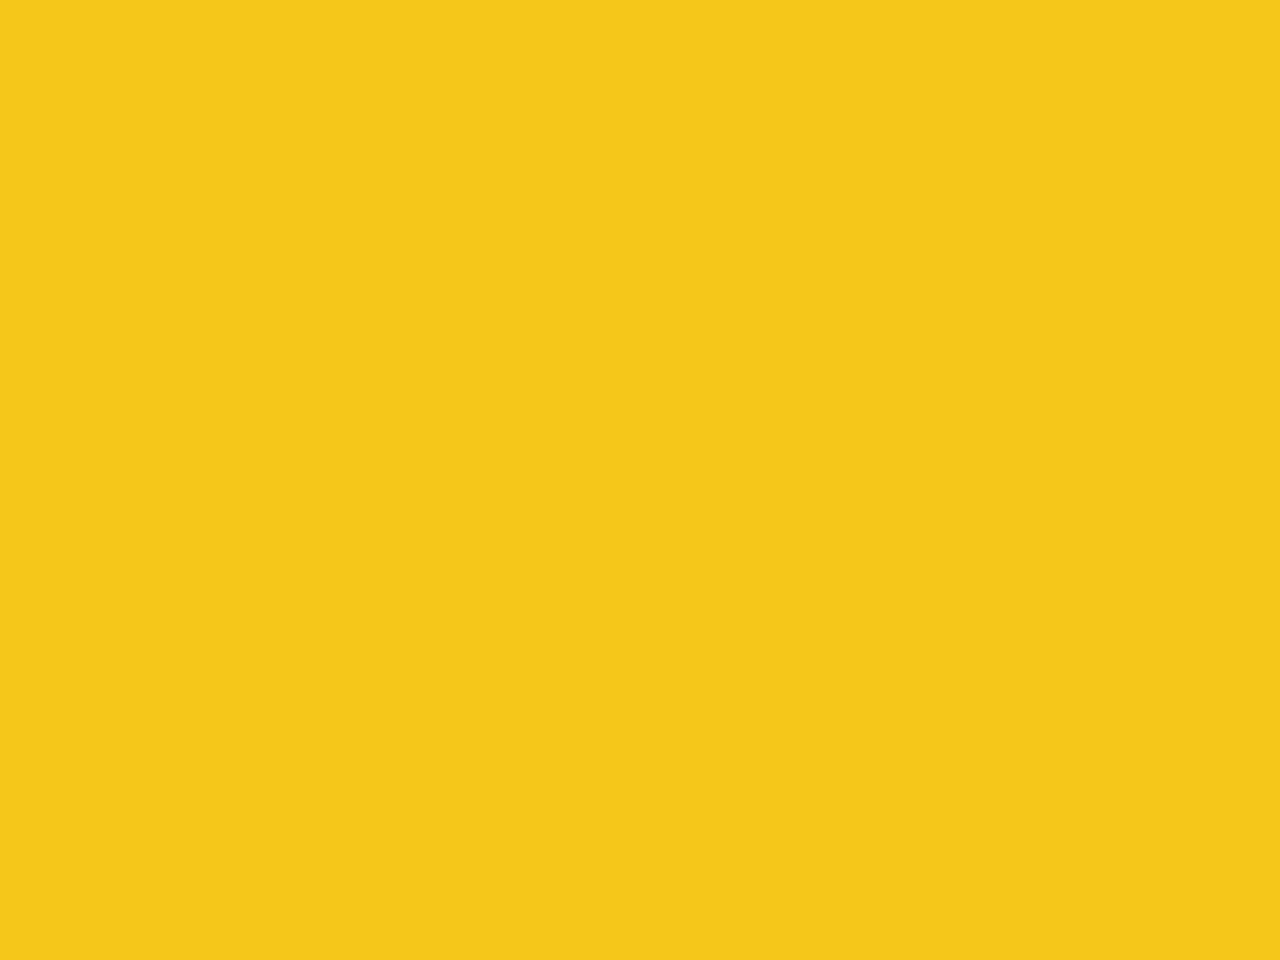 1280x960 Deep Lemon Solid Color Background